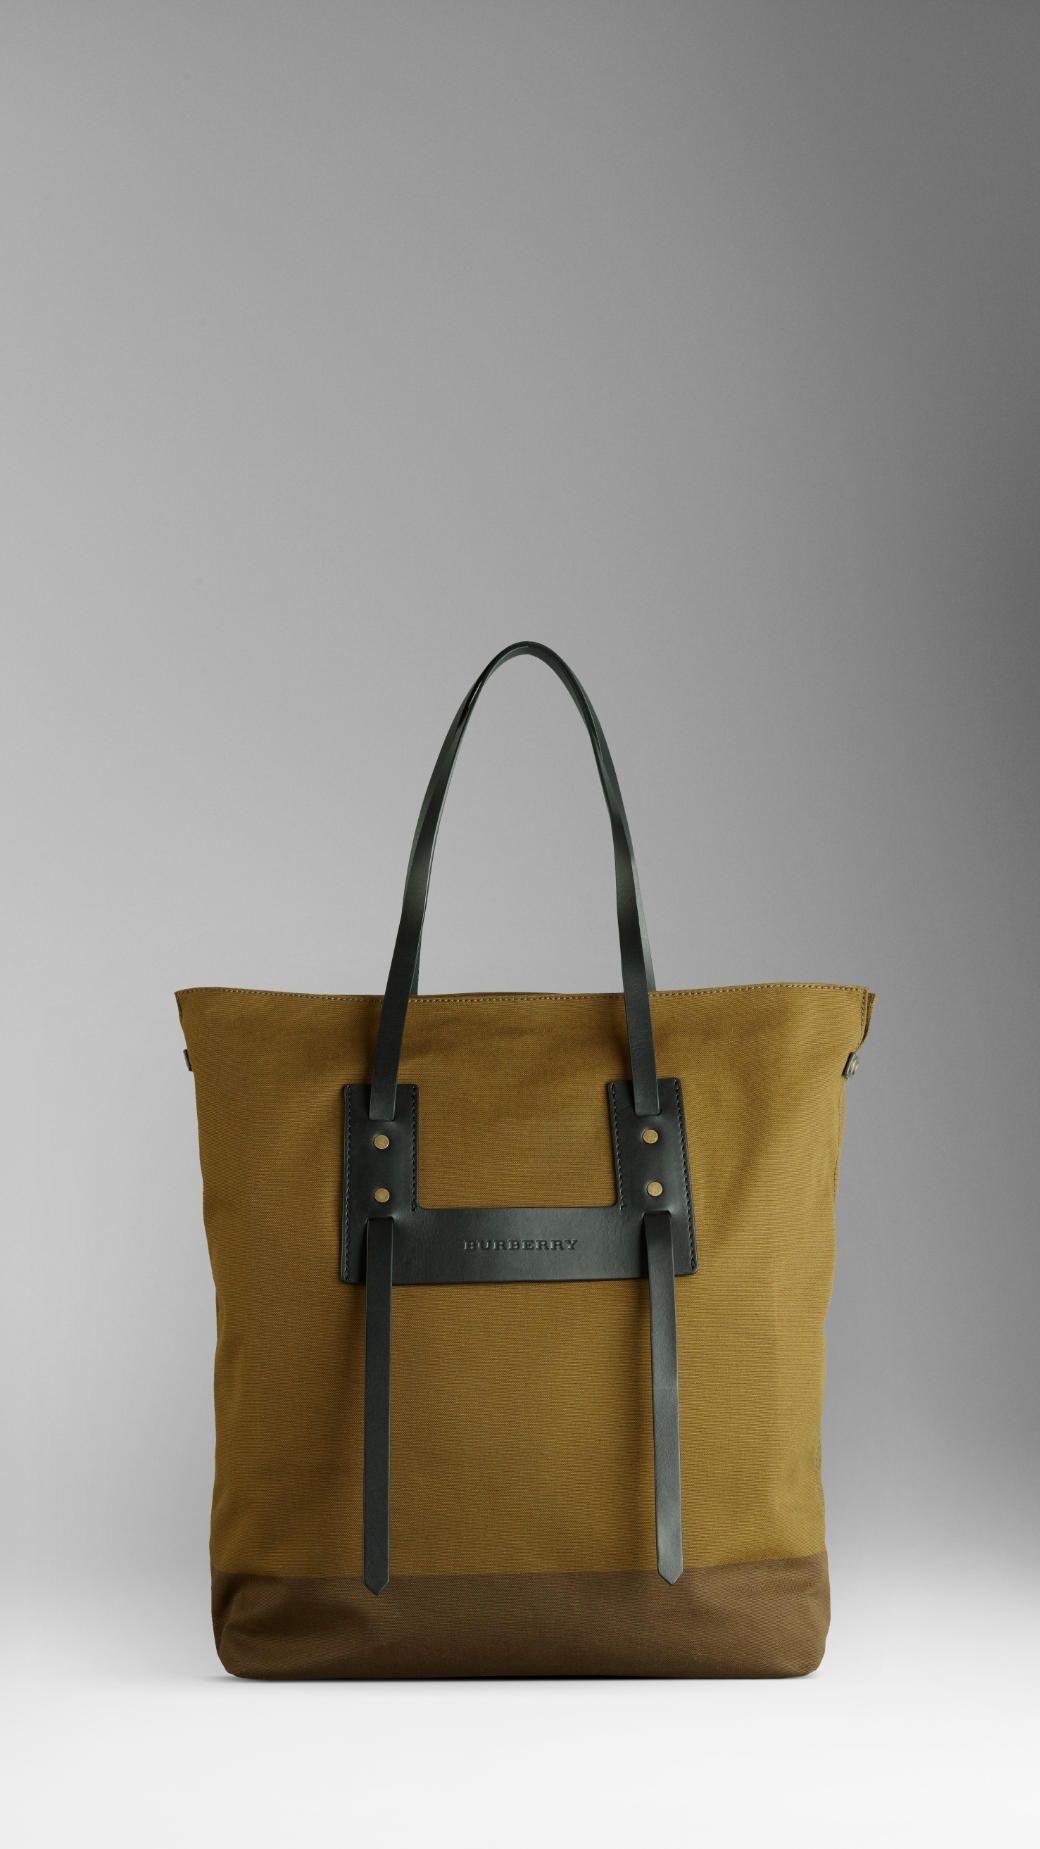 Burberry mens canvas tote bag   Travel bags   Sac, Cuir, Sac magique 3f5dc3f2be7